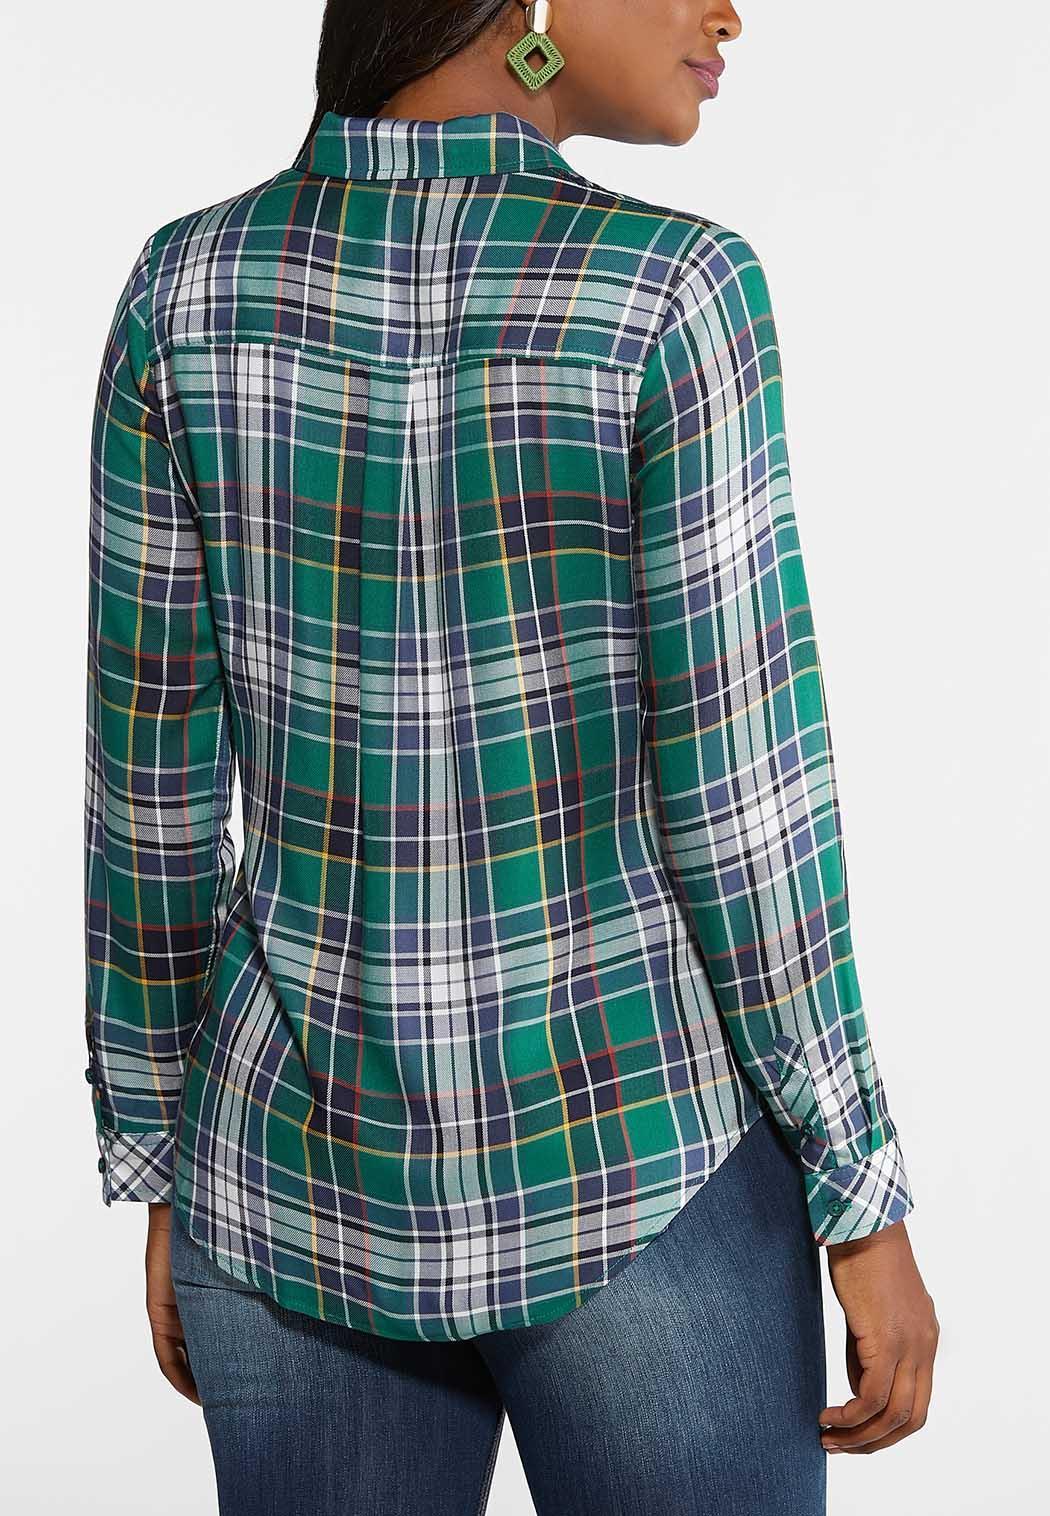 Plus Size Green Plaid Button Down Top (Item #43968511)